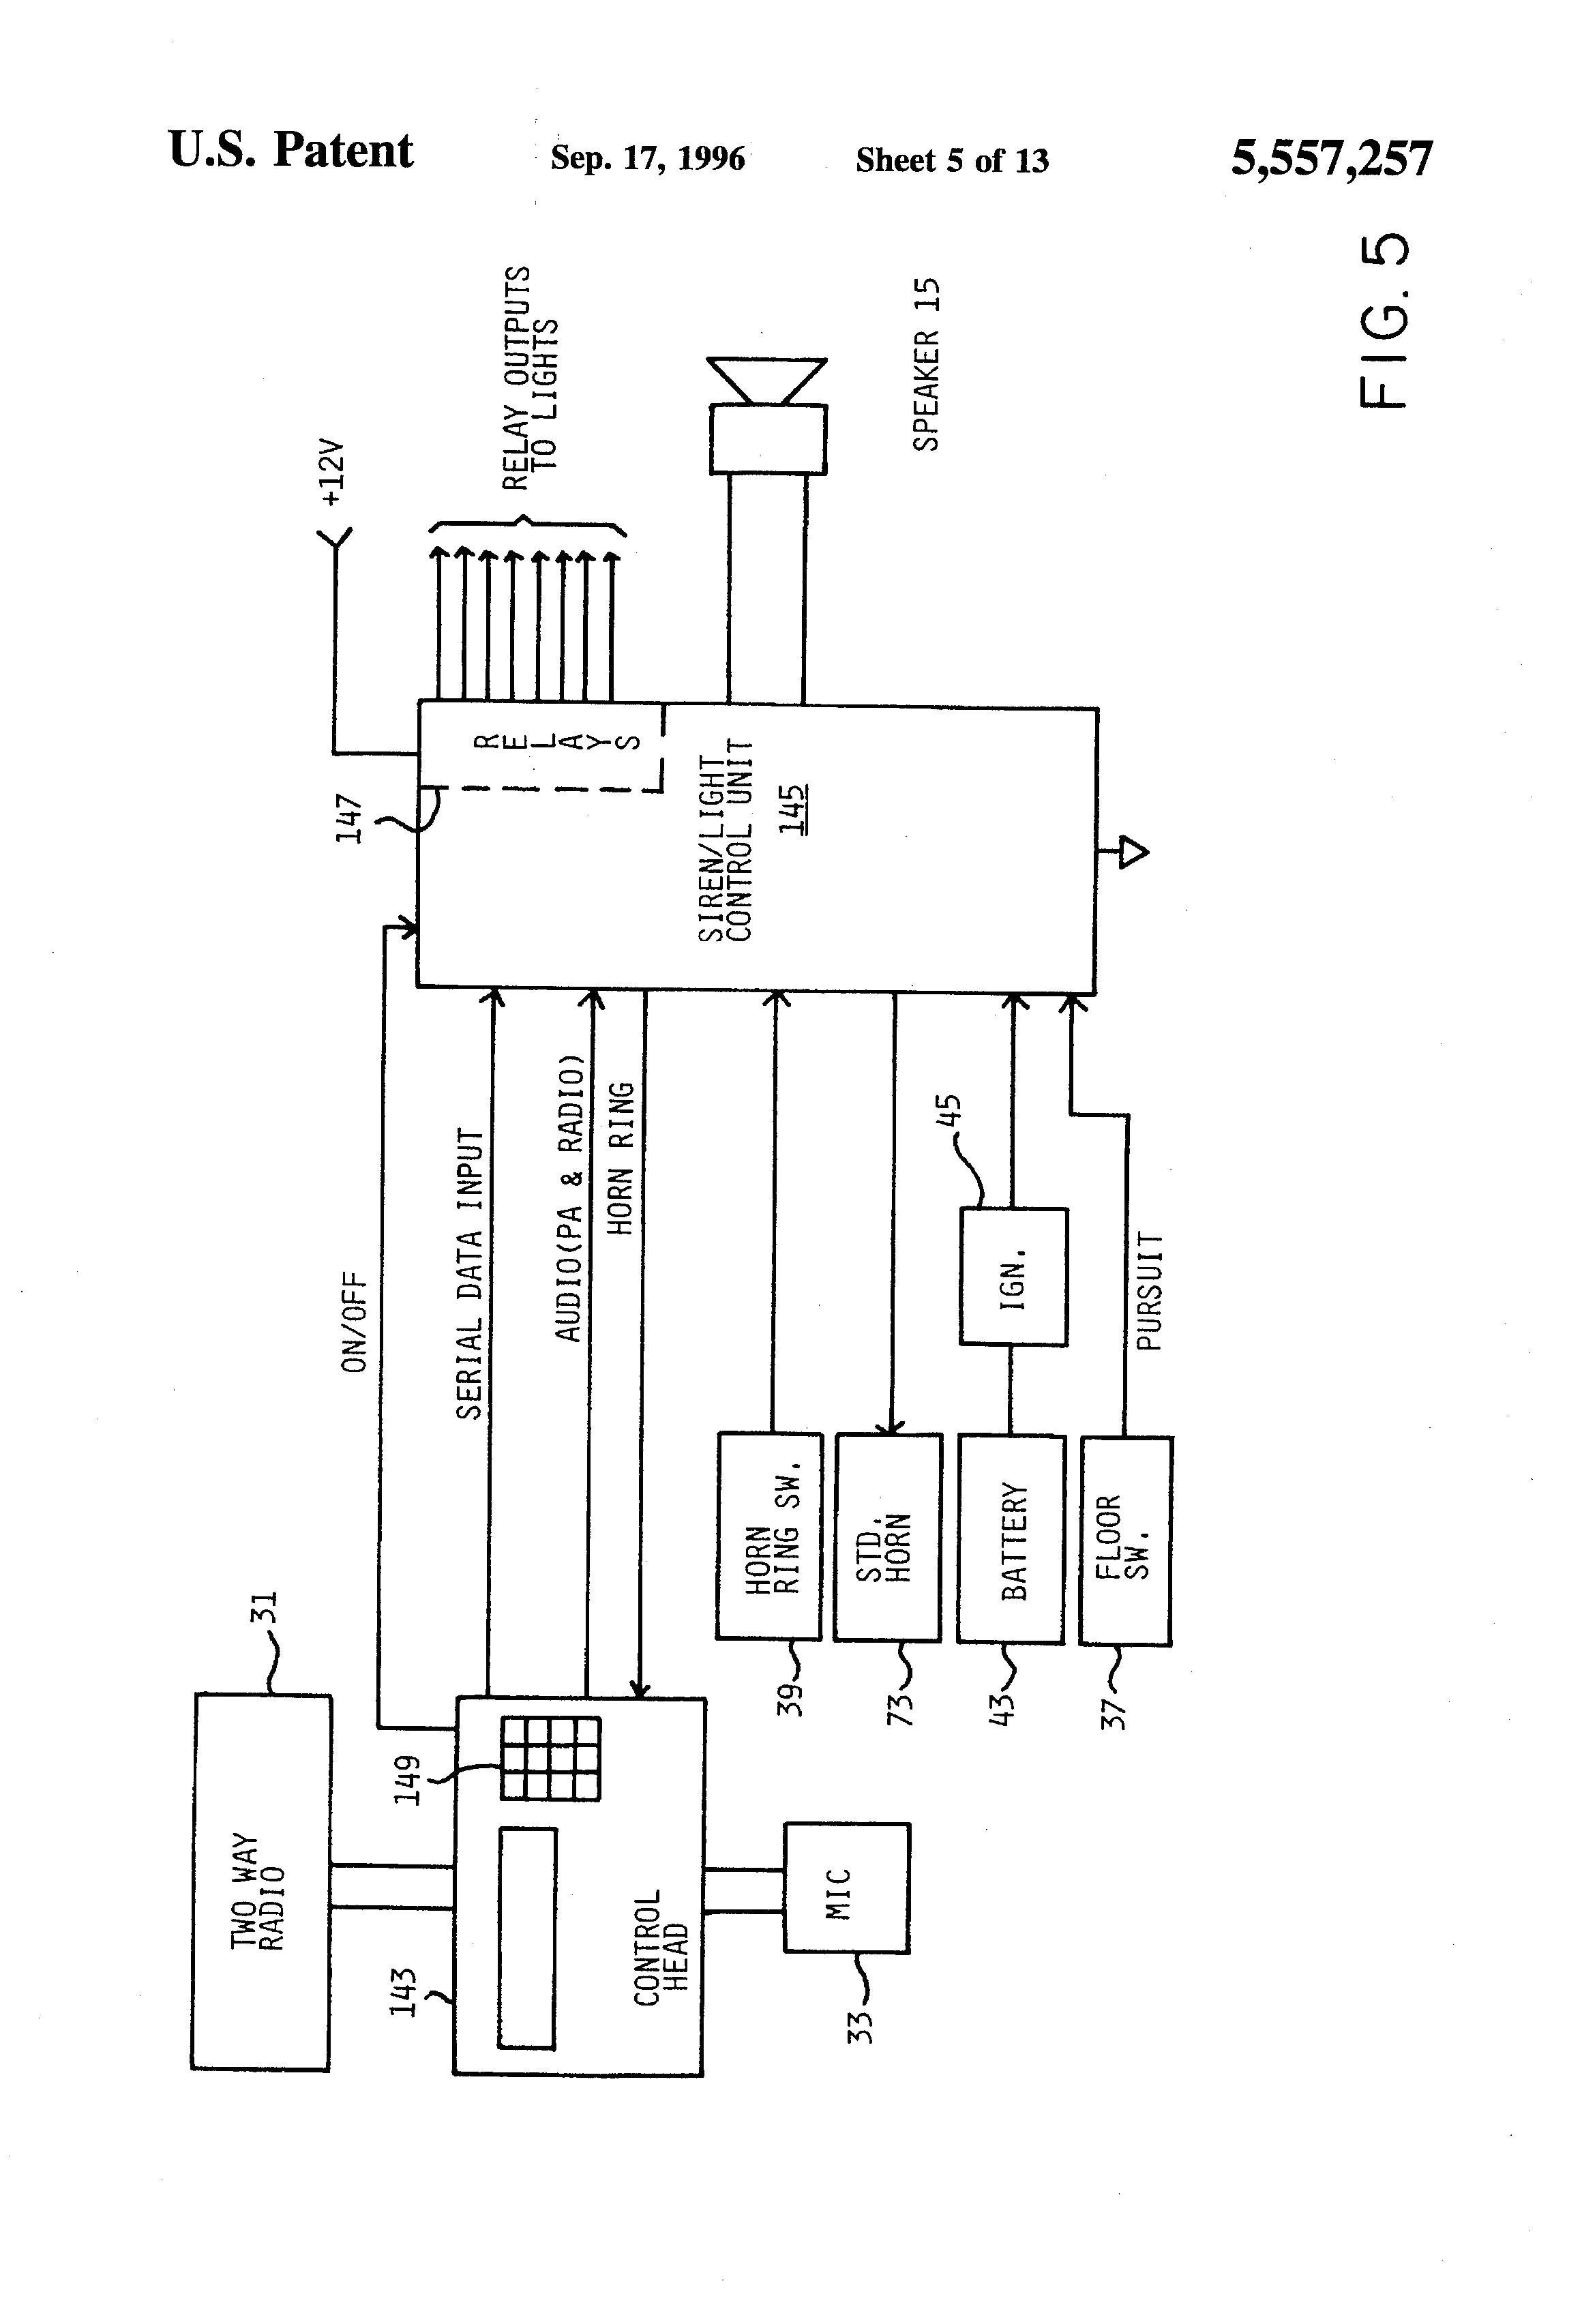 usstyle siren circuit diagram data wiring diagram preview siren wiring diagram electrical schematic wiring diagram svp